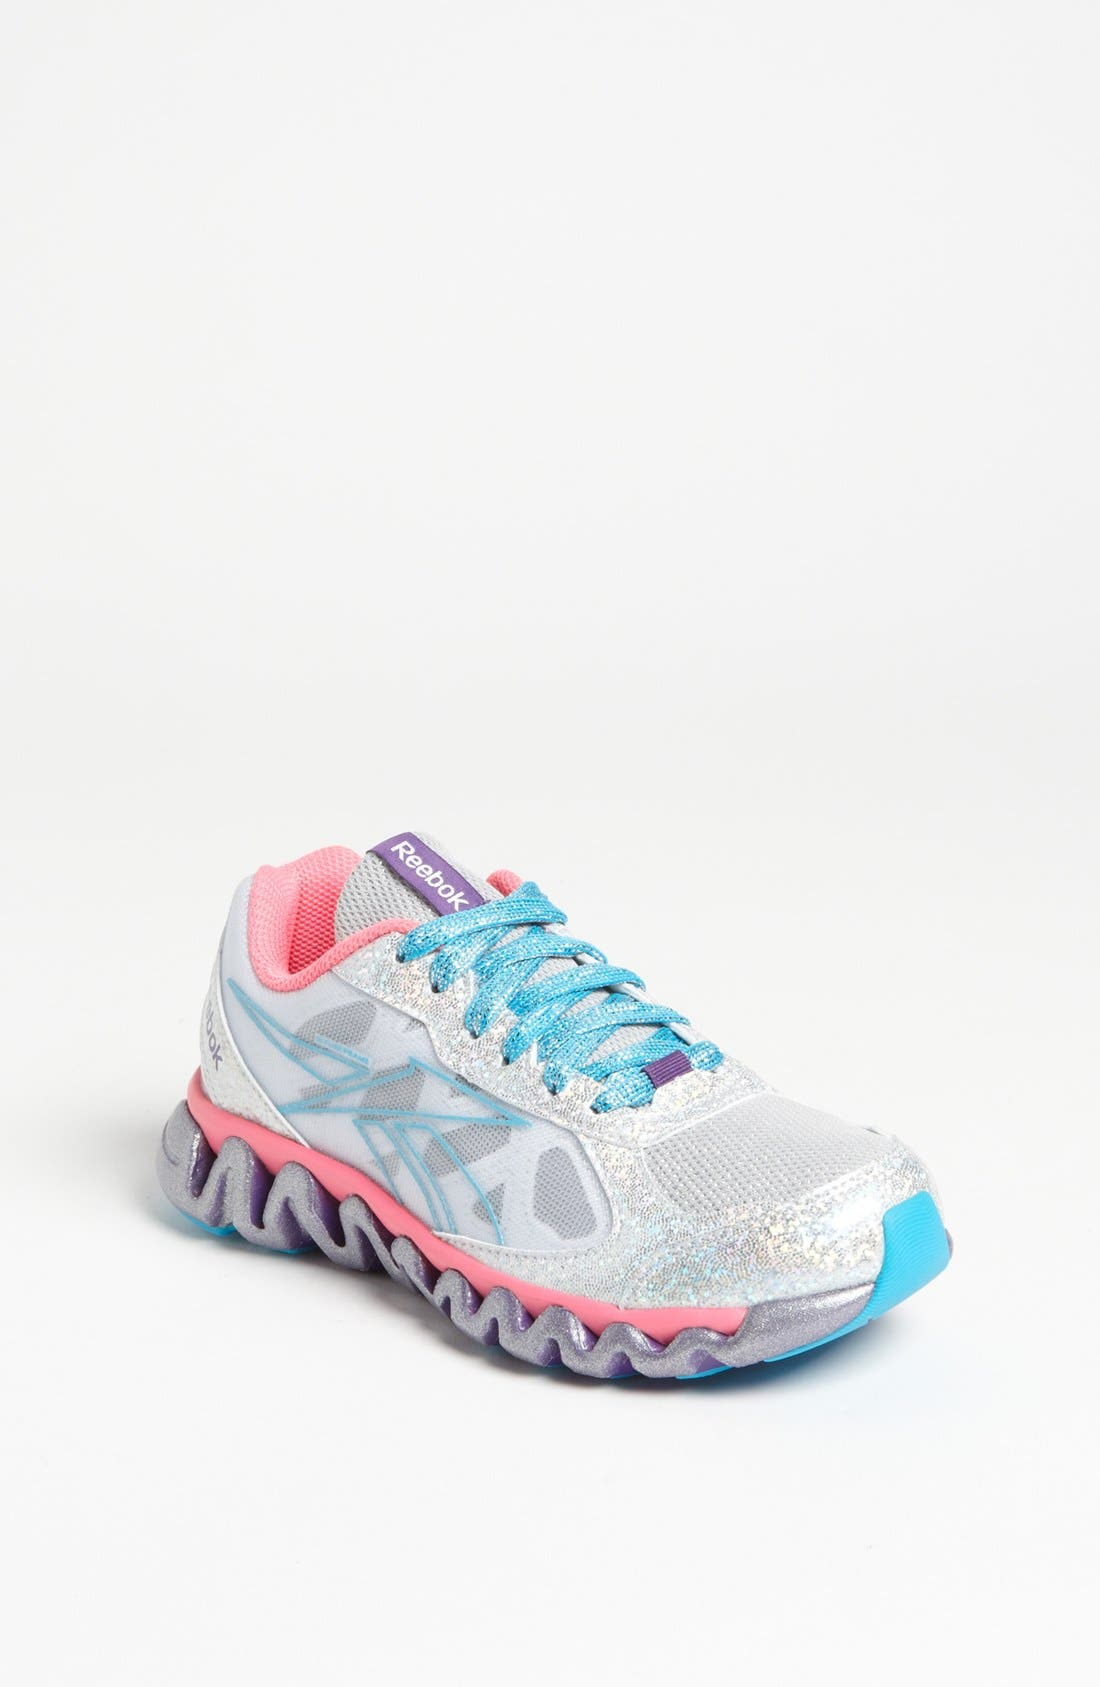 Alternate Image 1 Selected - Reebok 'ZigLite Rush' Sneaker (Toddler & Little Kid)